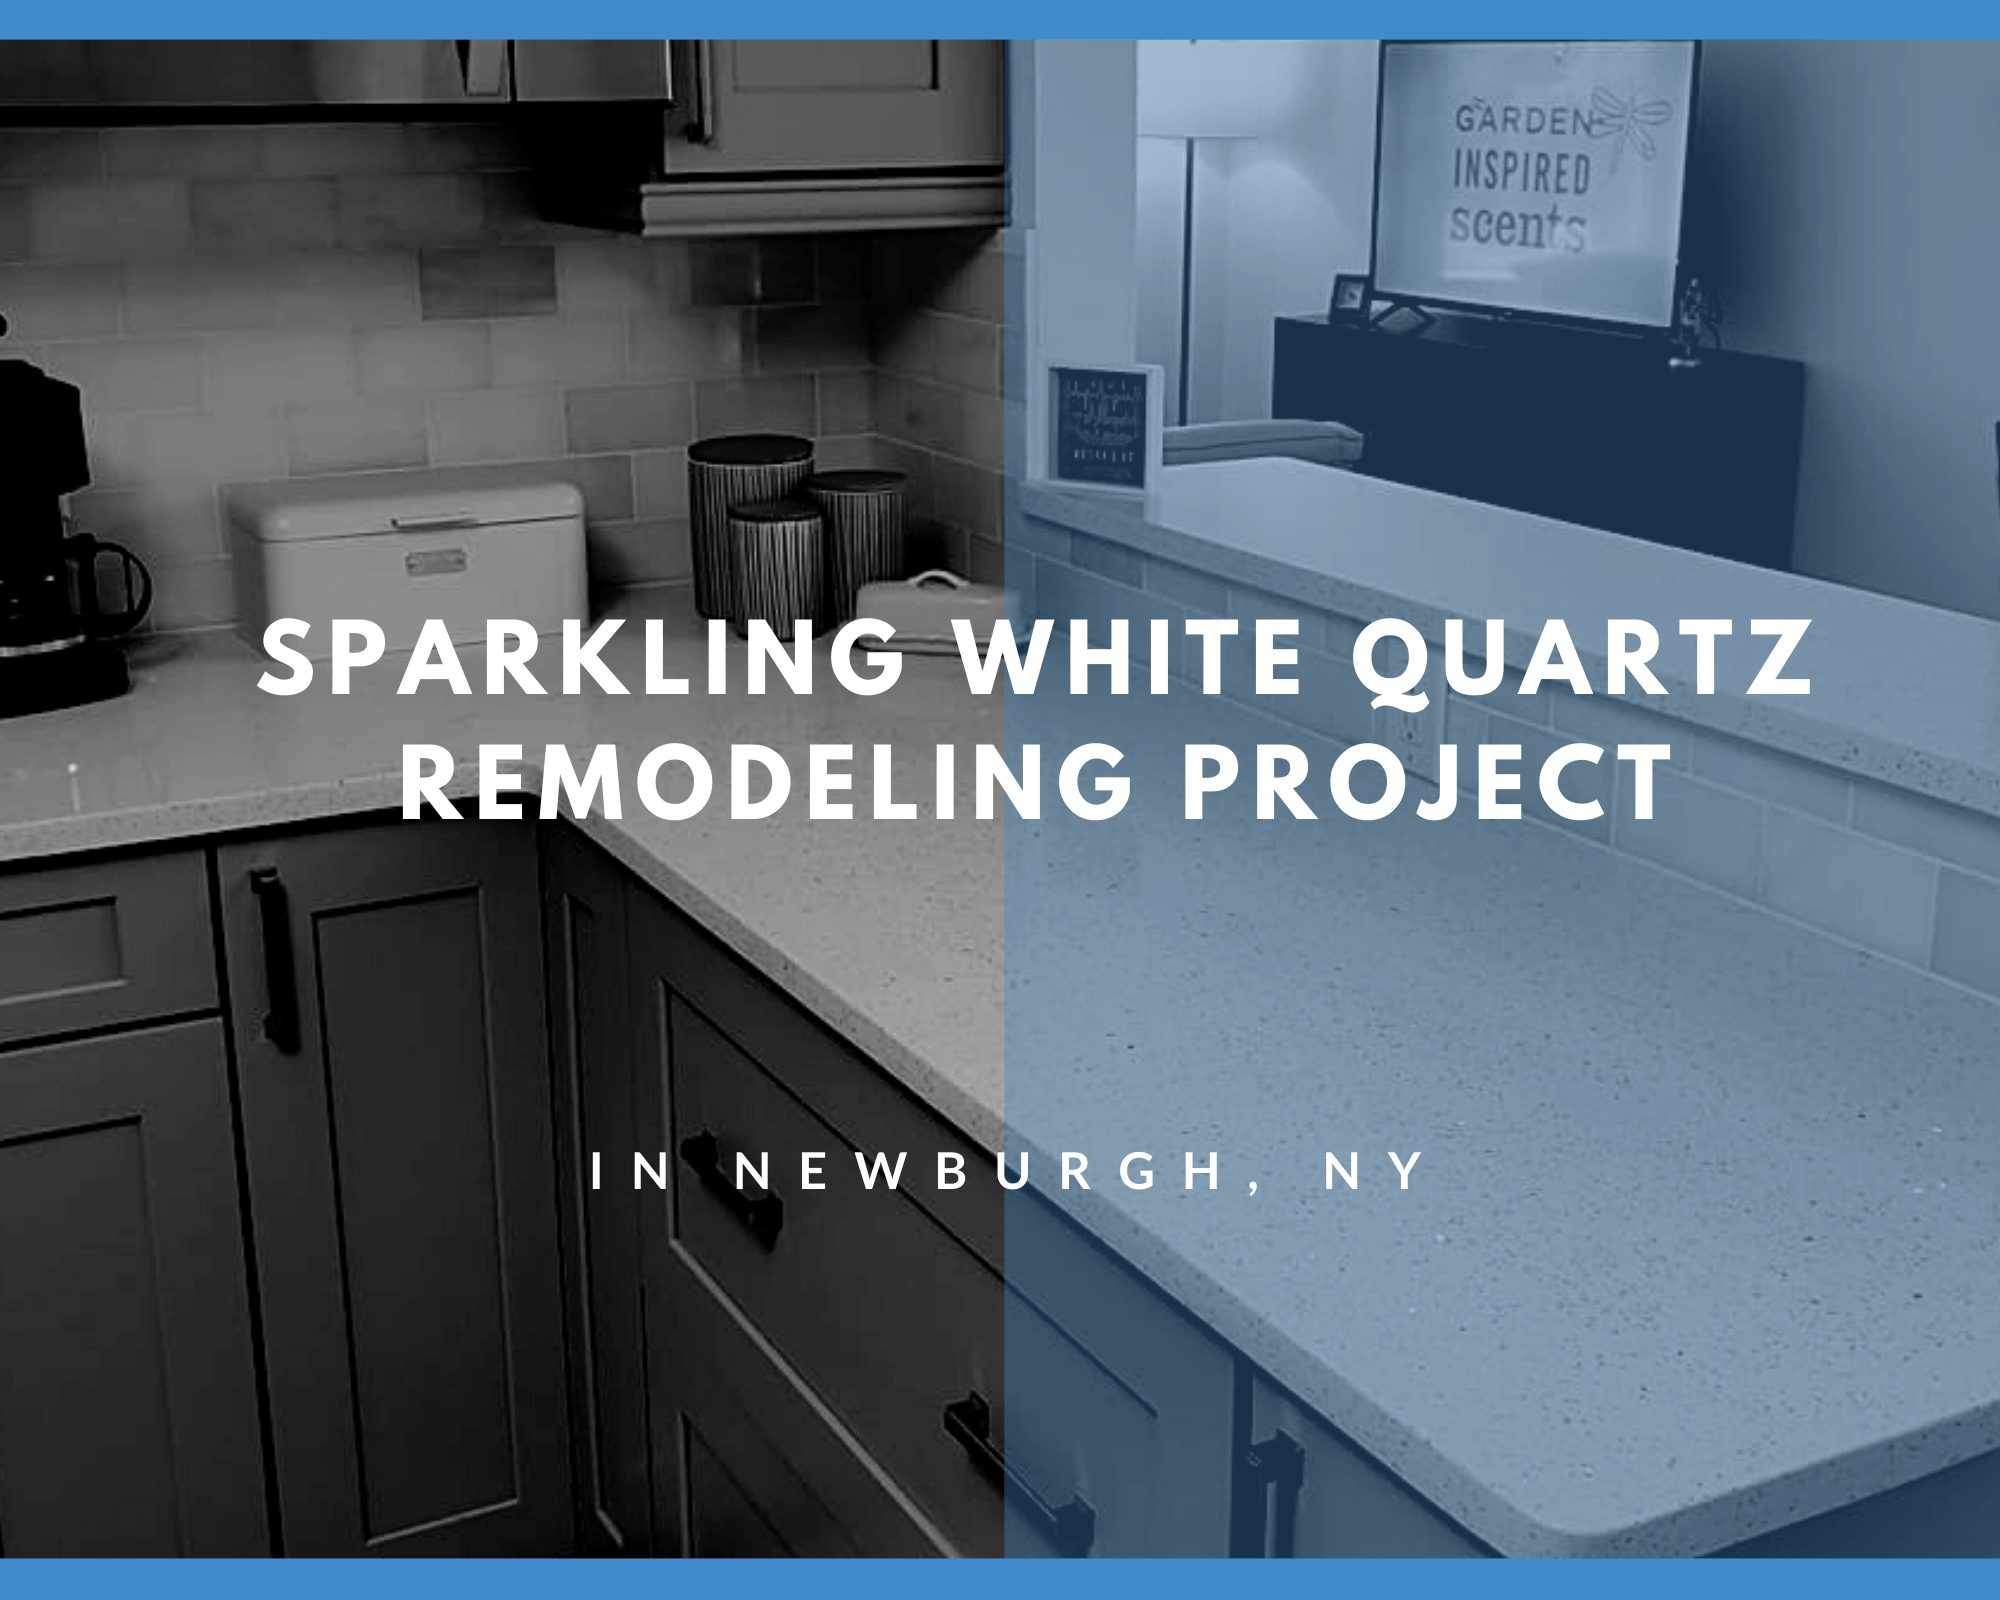 Sparkling White Quartz Installation in Newburgh, NY